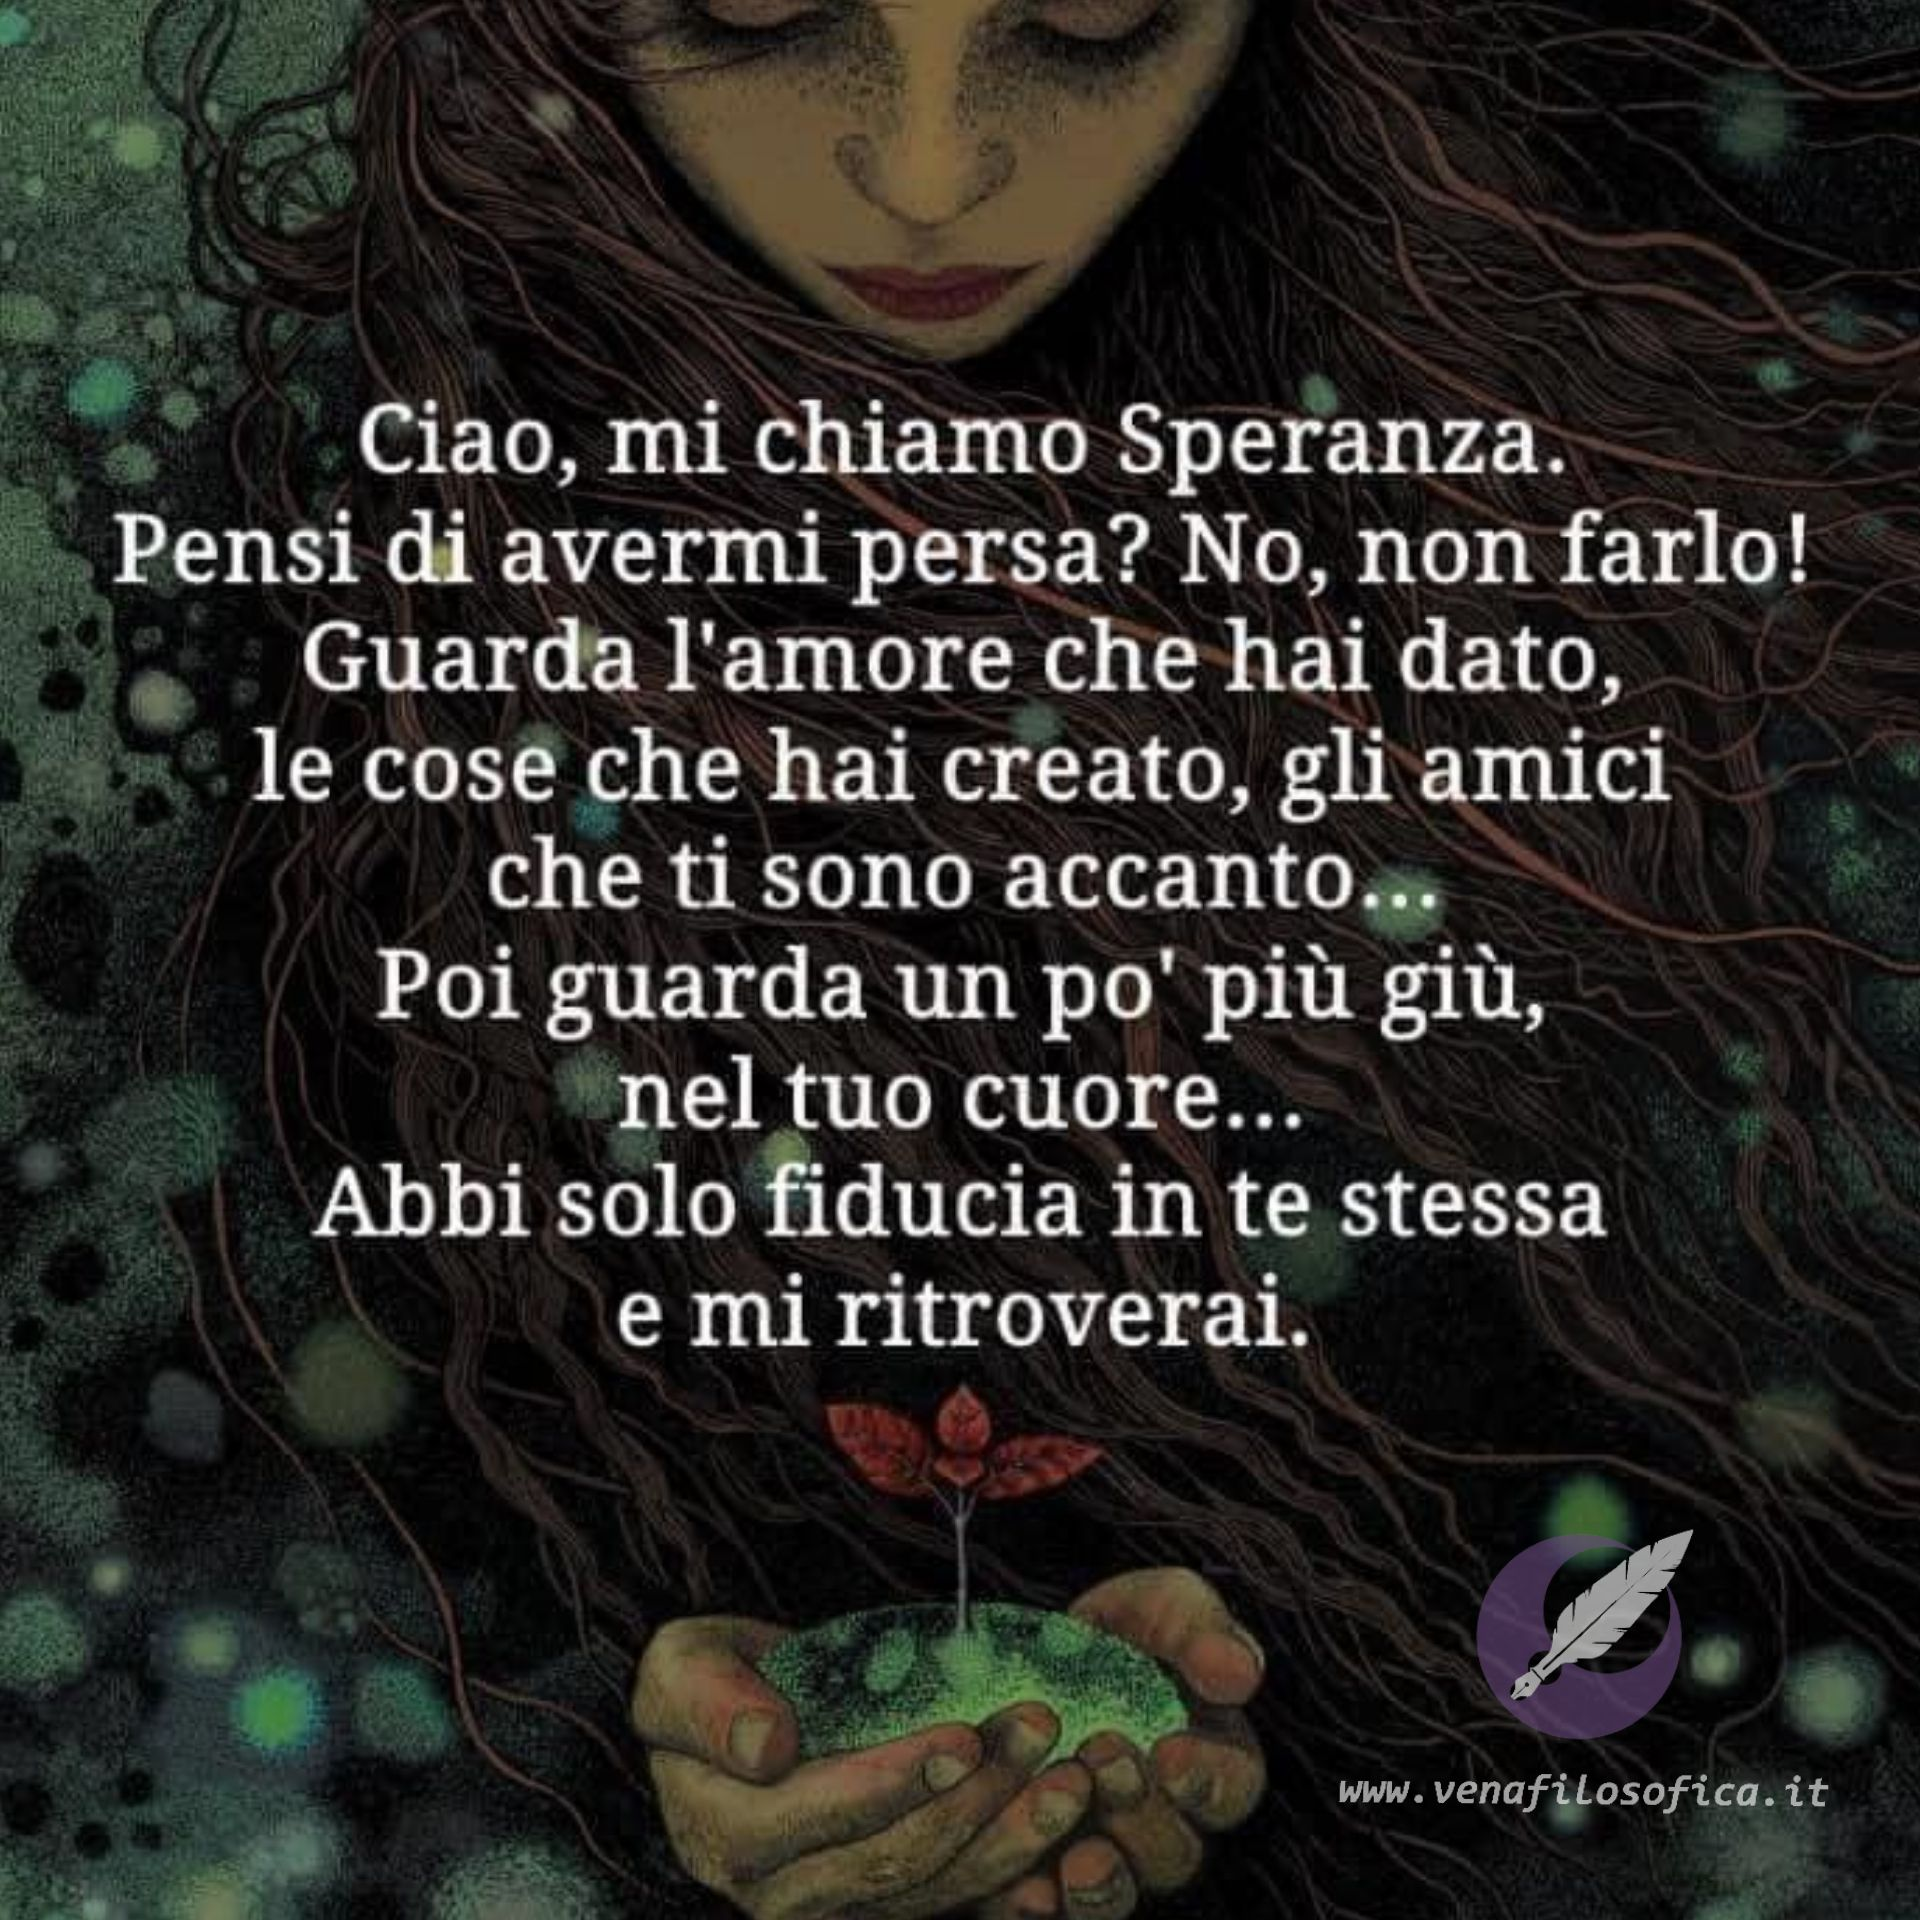 #poesiadistrada #amoremio #frasitumblr #pensierieparole #poesie #pensieri #parole #tiamo #frasi #versi #scrivere #frasibelle #aforismi #frasiamore #paroledamore #frasitop #frasidivita #venafilosofica #scrivilosuimuri #frasiitaliane #frasistronze #frasimotivazionali #frasiitalia #frasidivertenti #frasirap #persempre #speranza . 👉 visita www.venafilosofica.it per altre frasi 💕